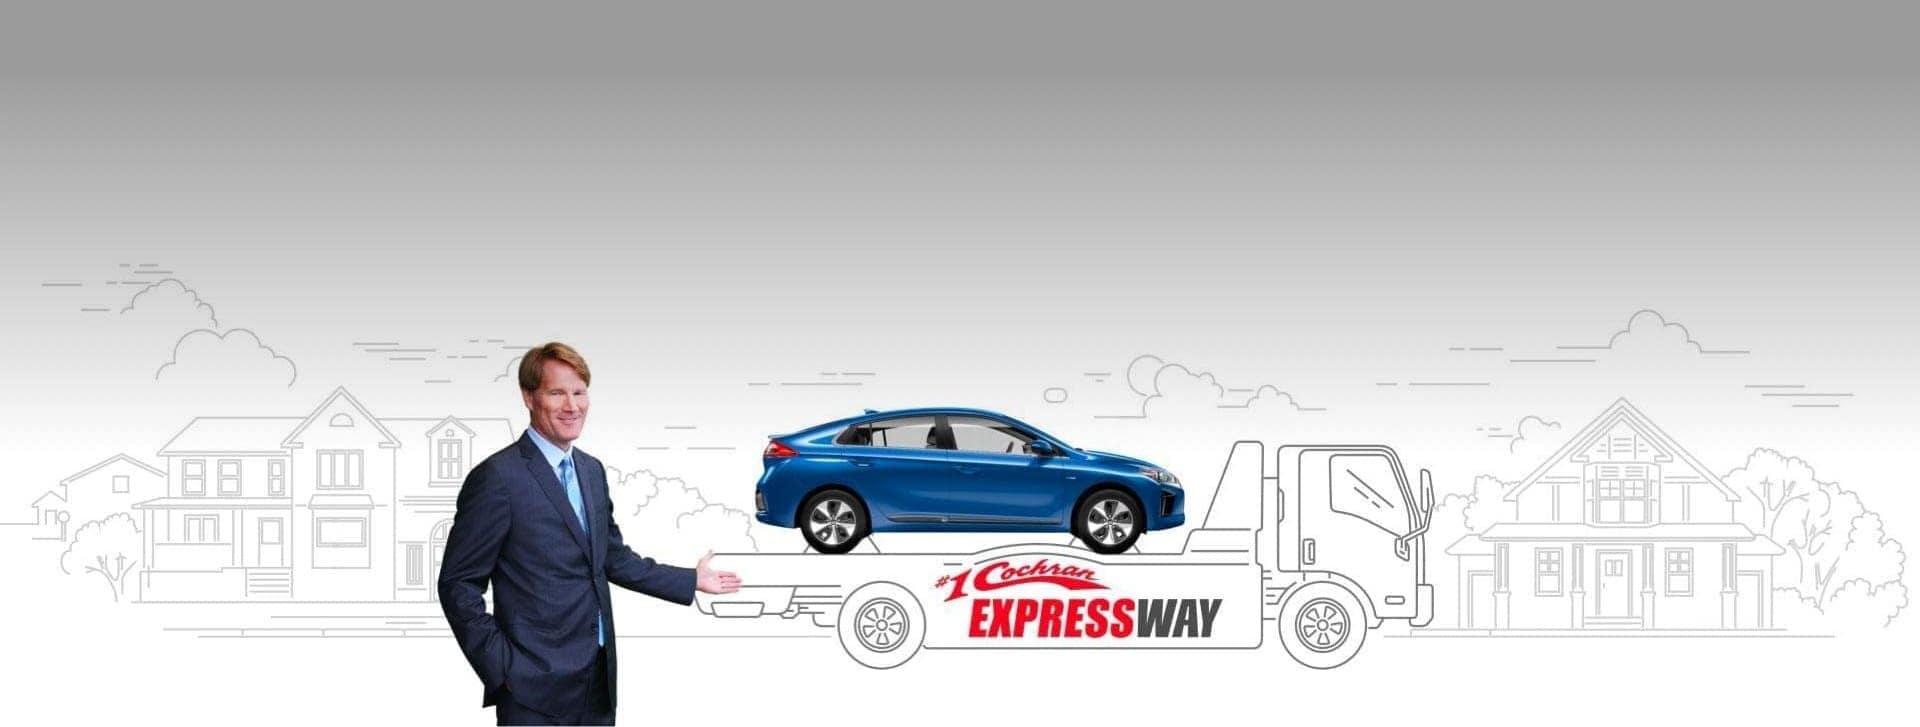 expressway-tow-hero-slide-edited